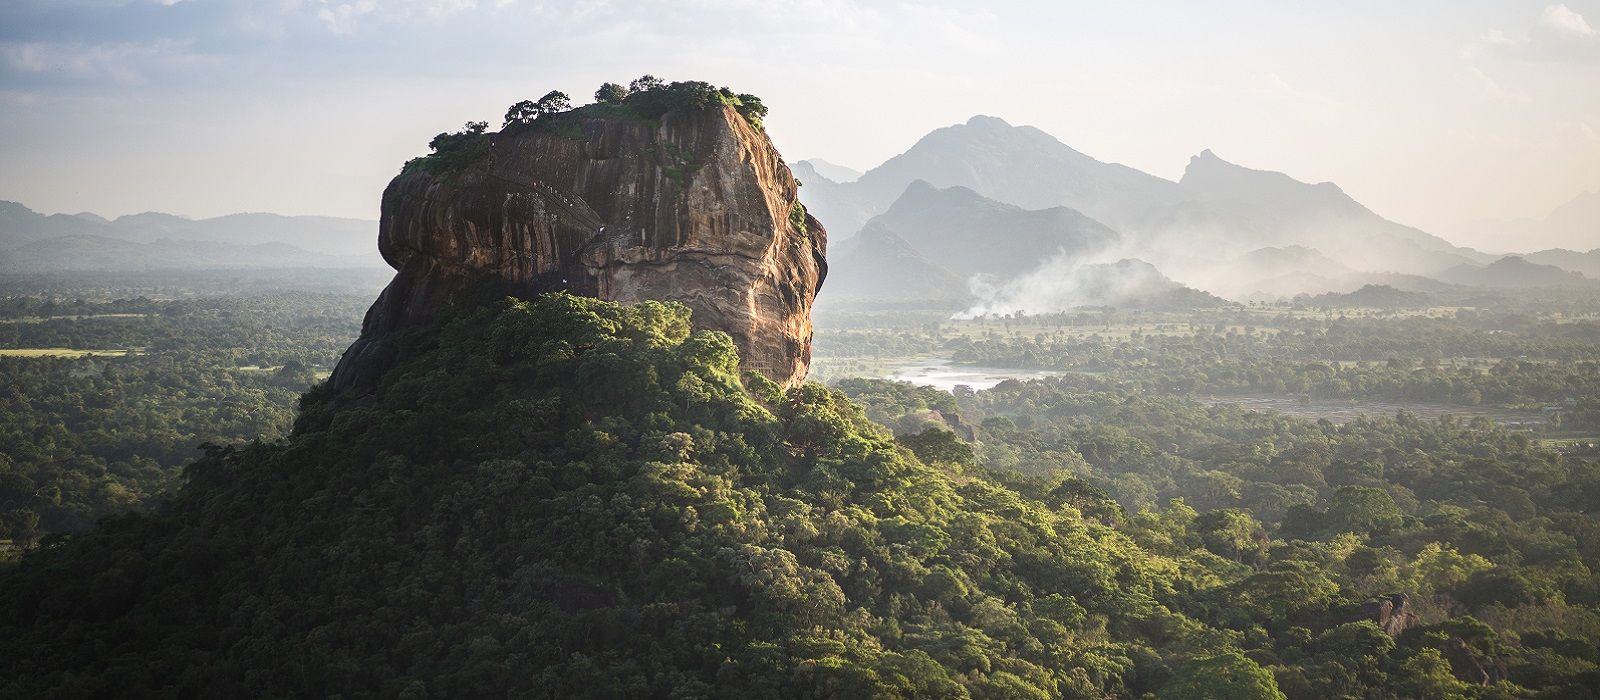 Signature of Sri Lanka Tour Trip 2